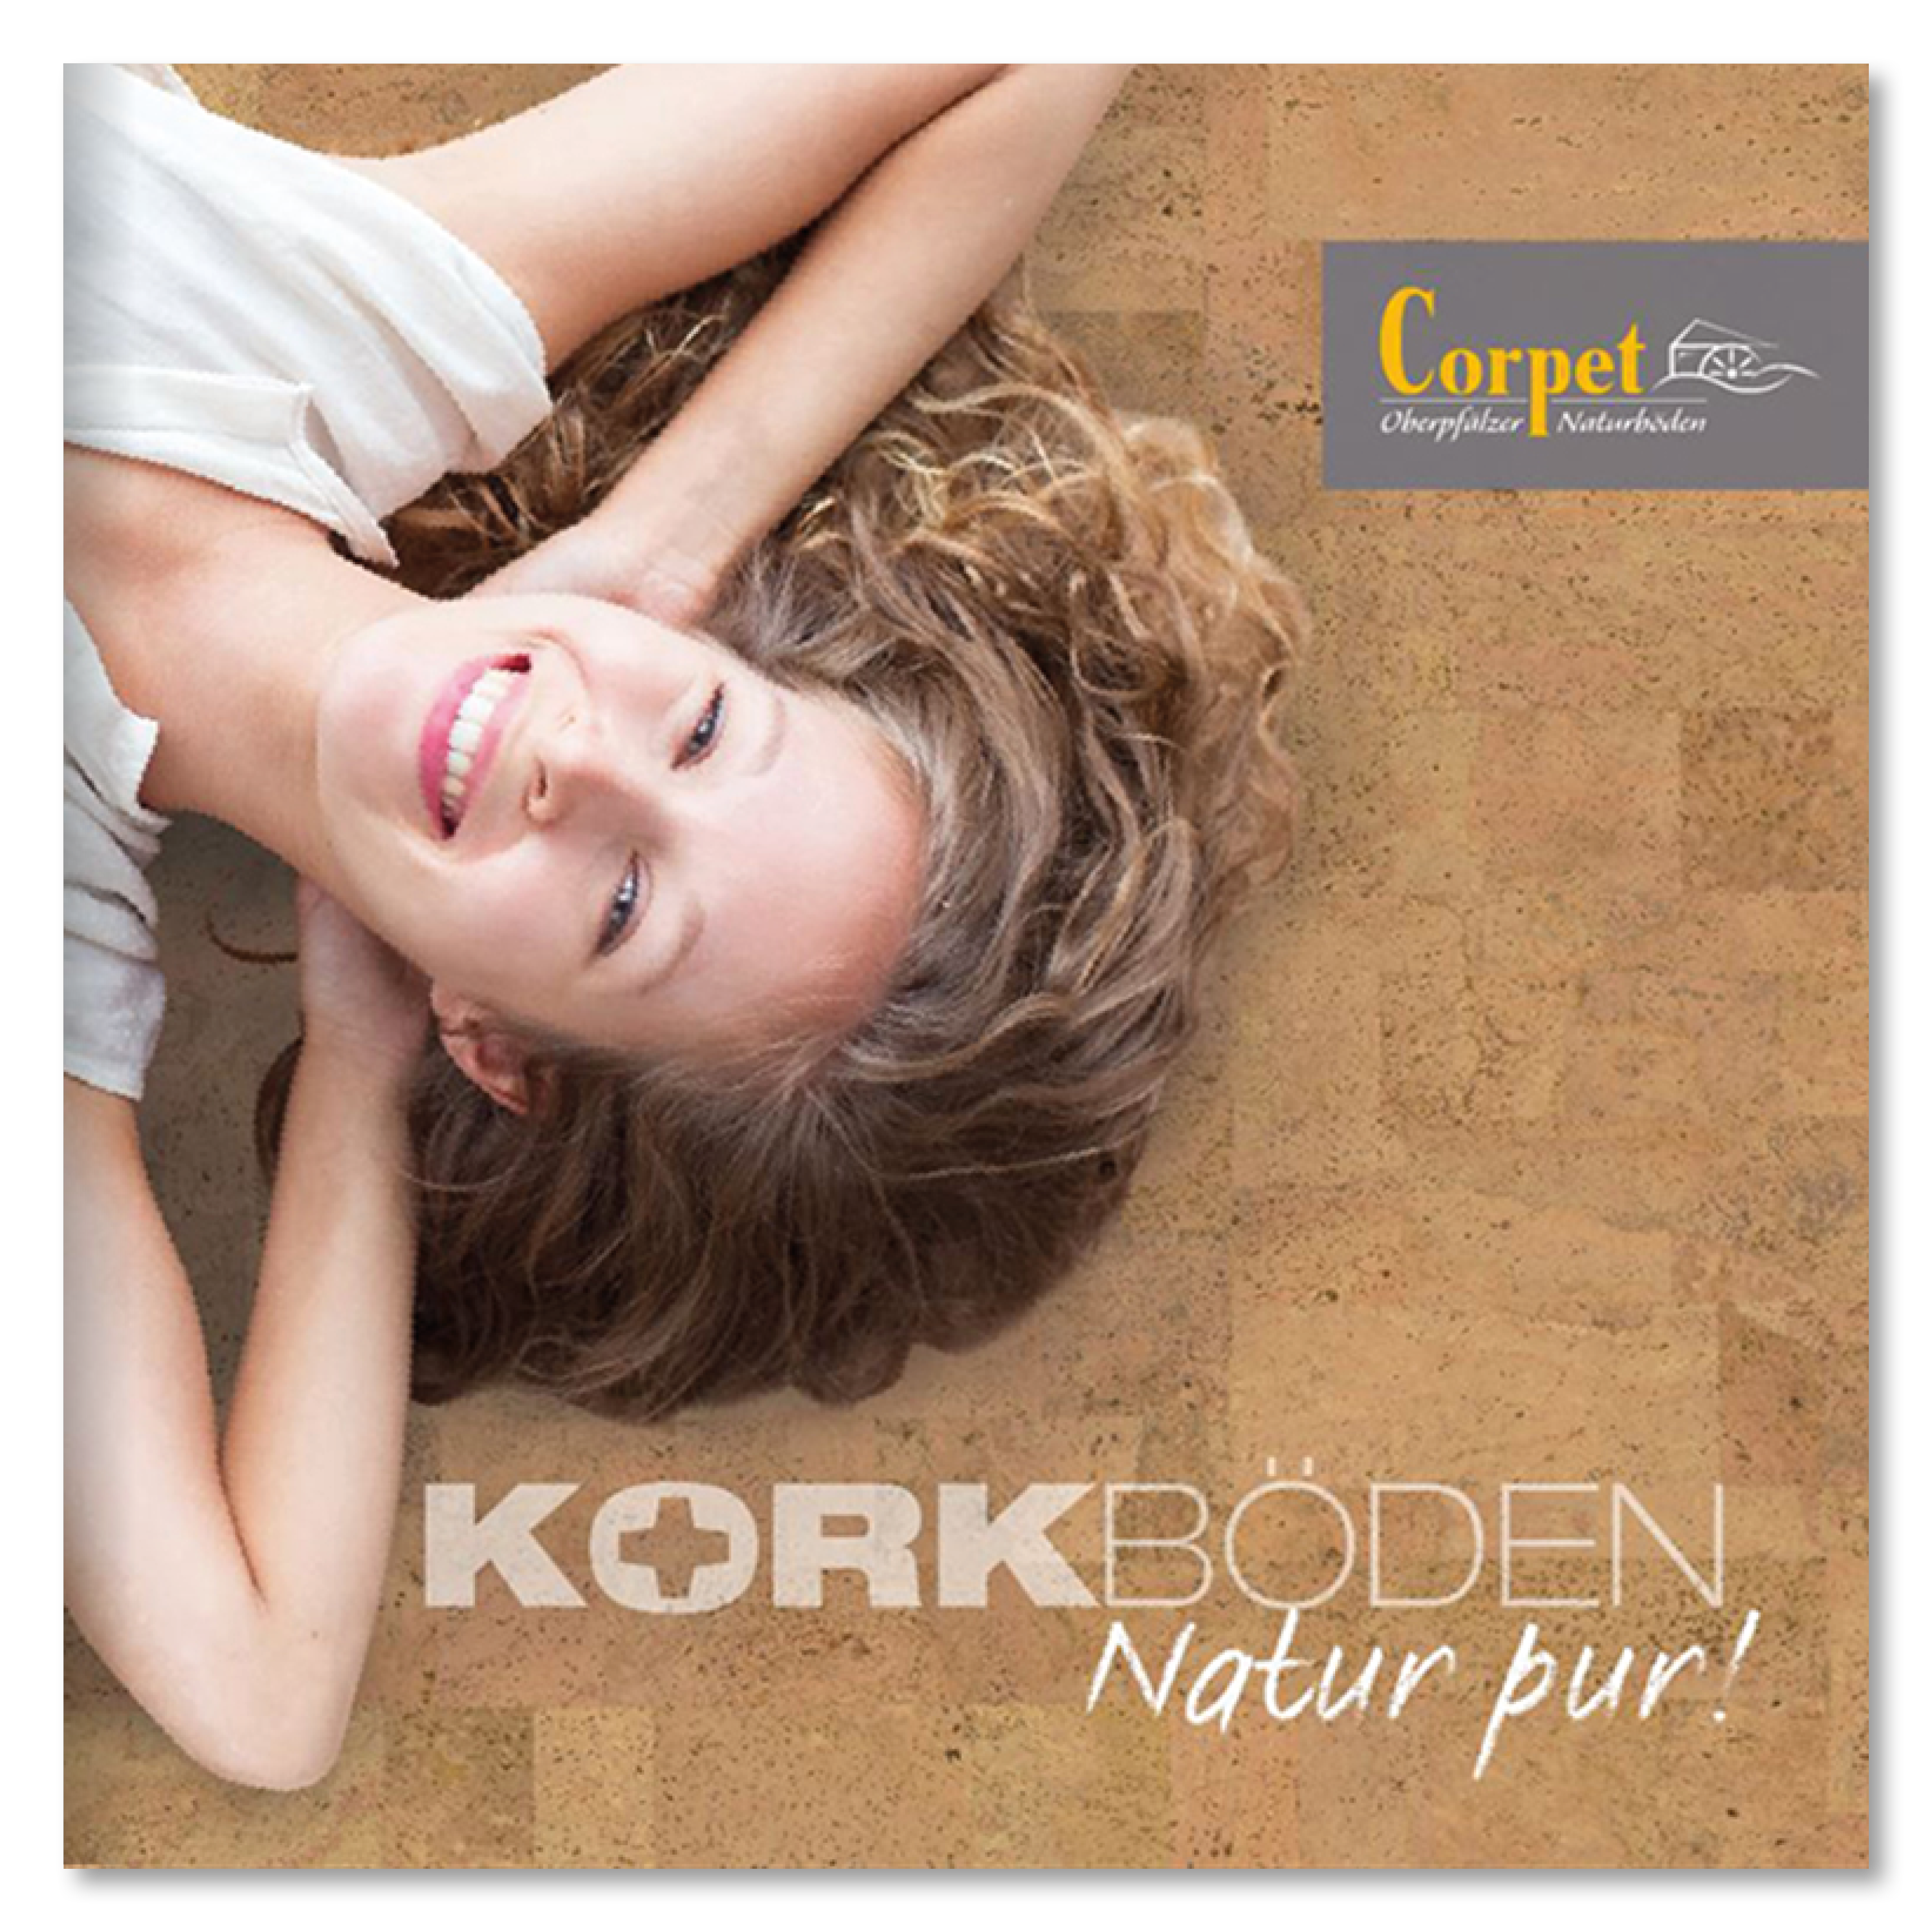 CC_Korkboeden_Katalog